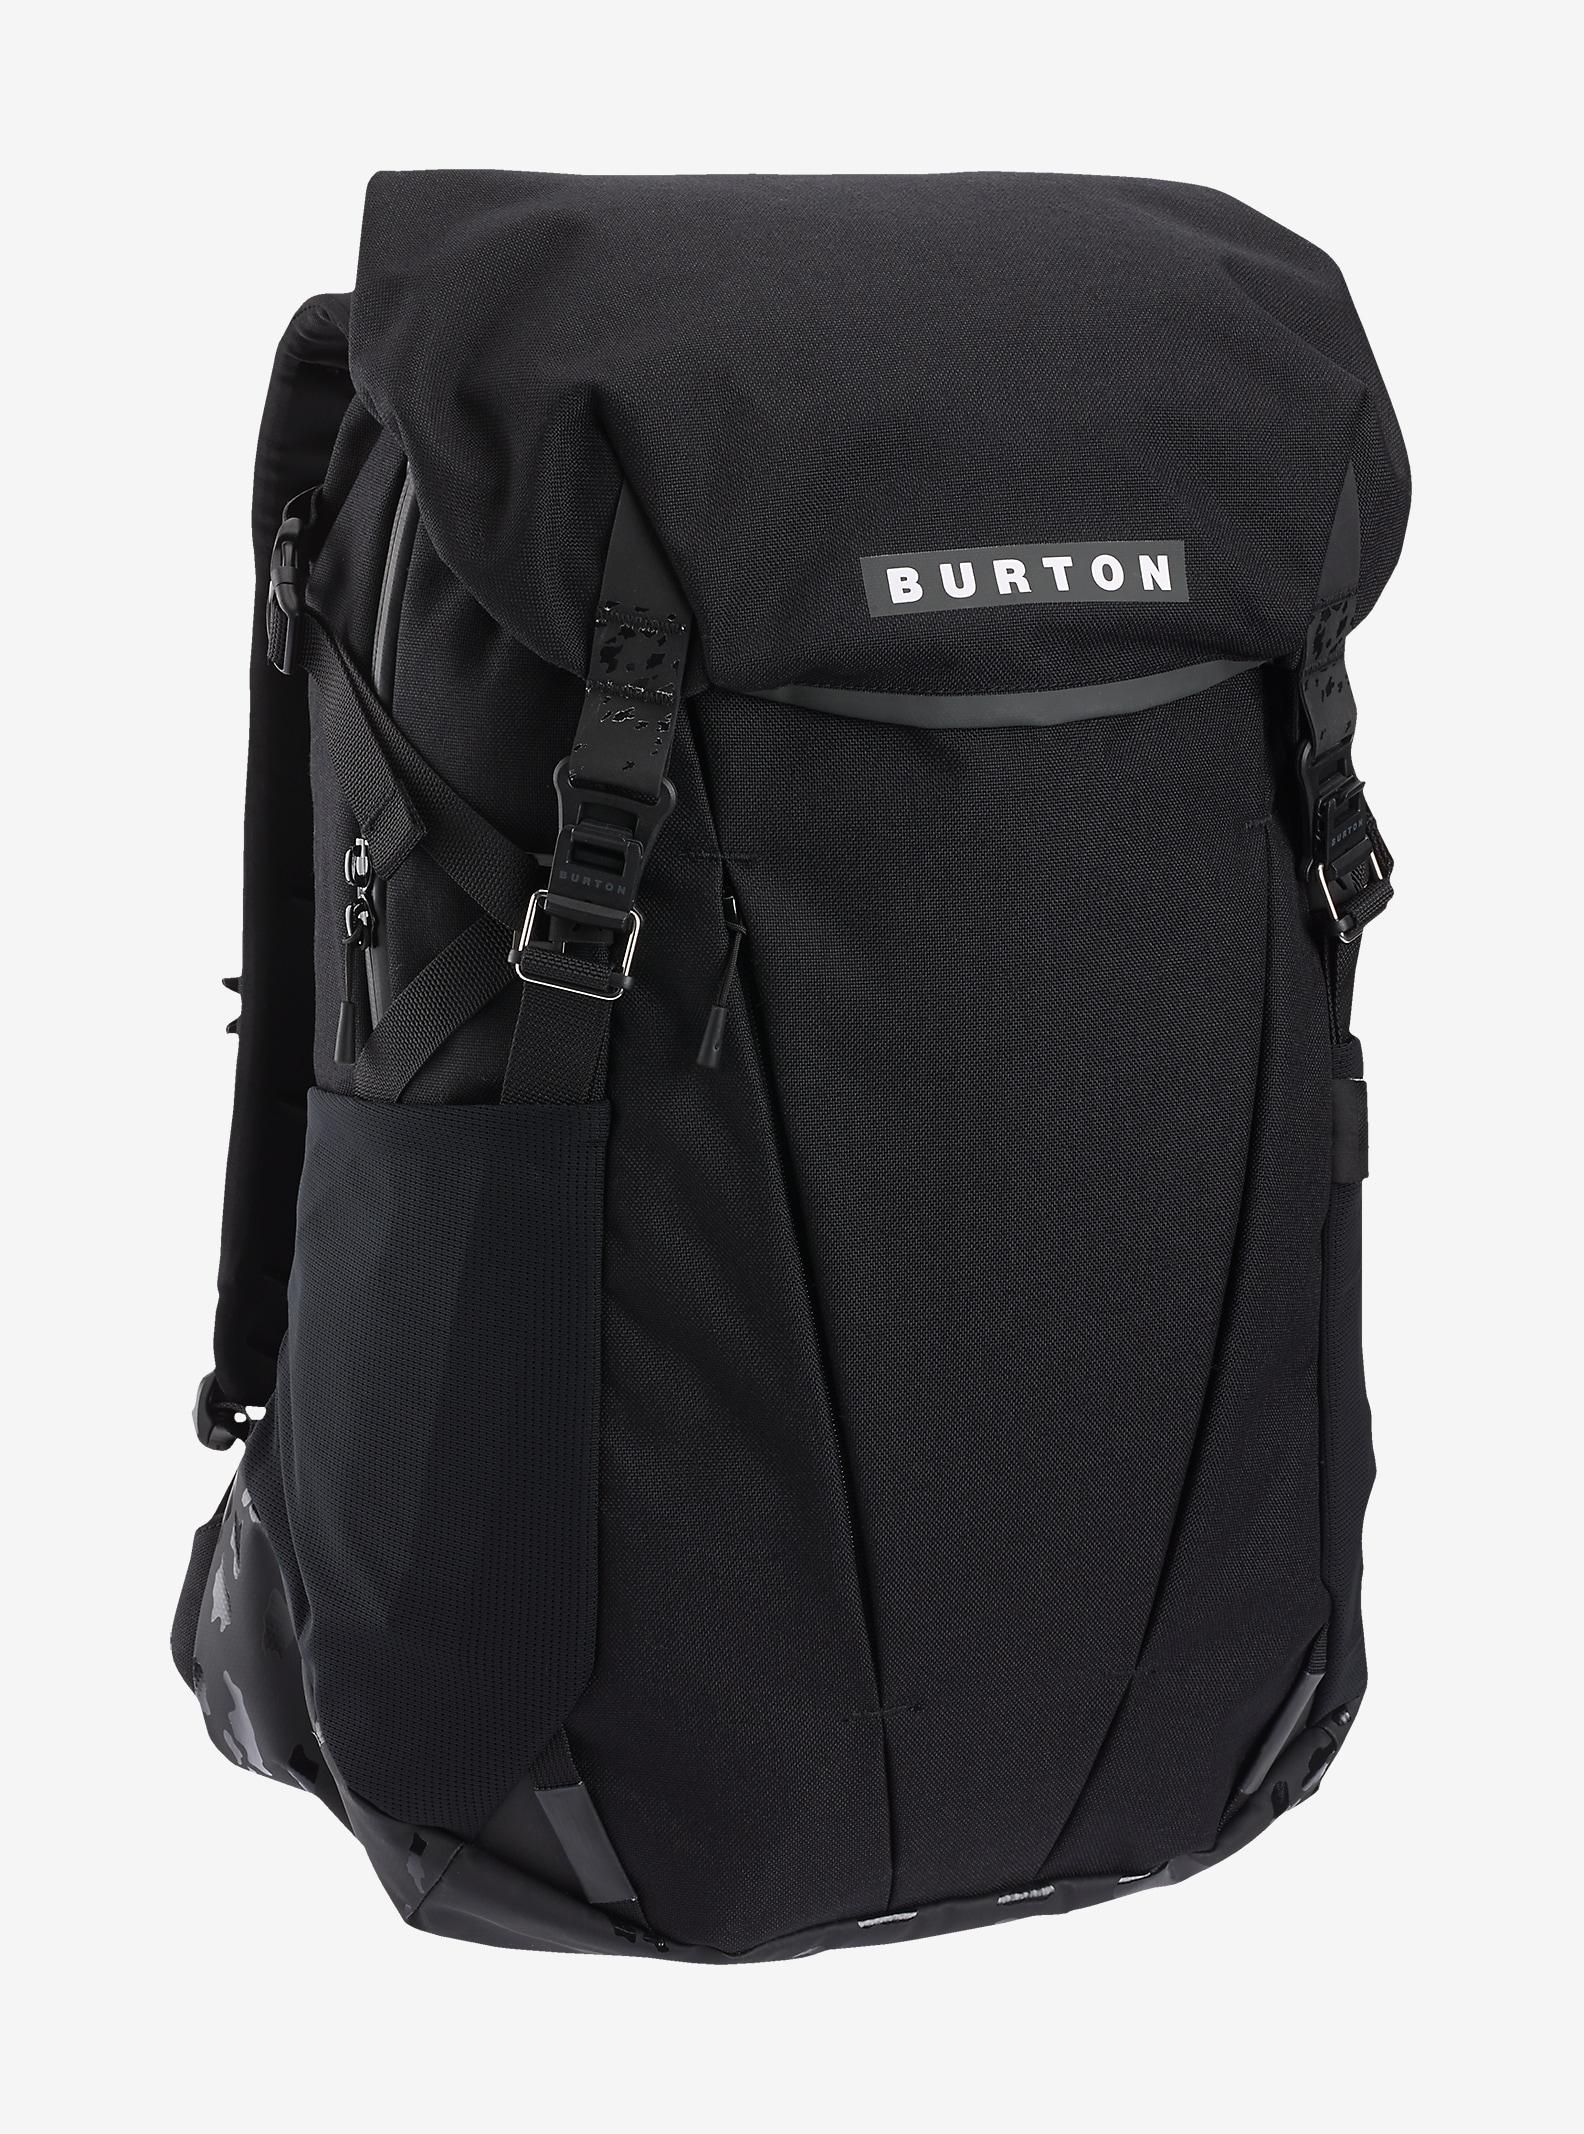 Burton Spruce Pack shown in True Black Cordura®